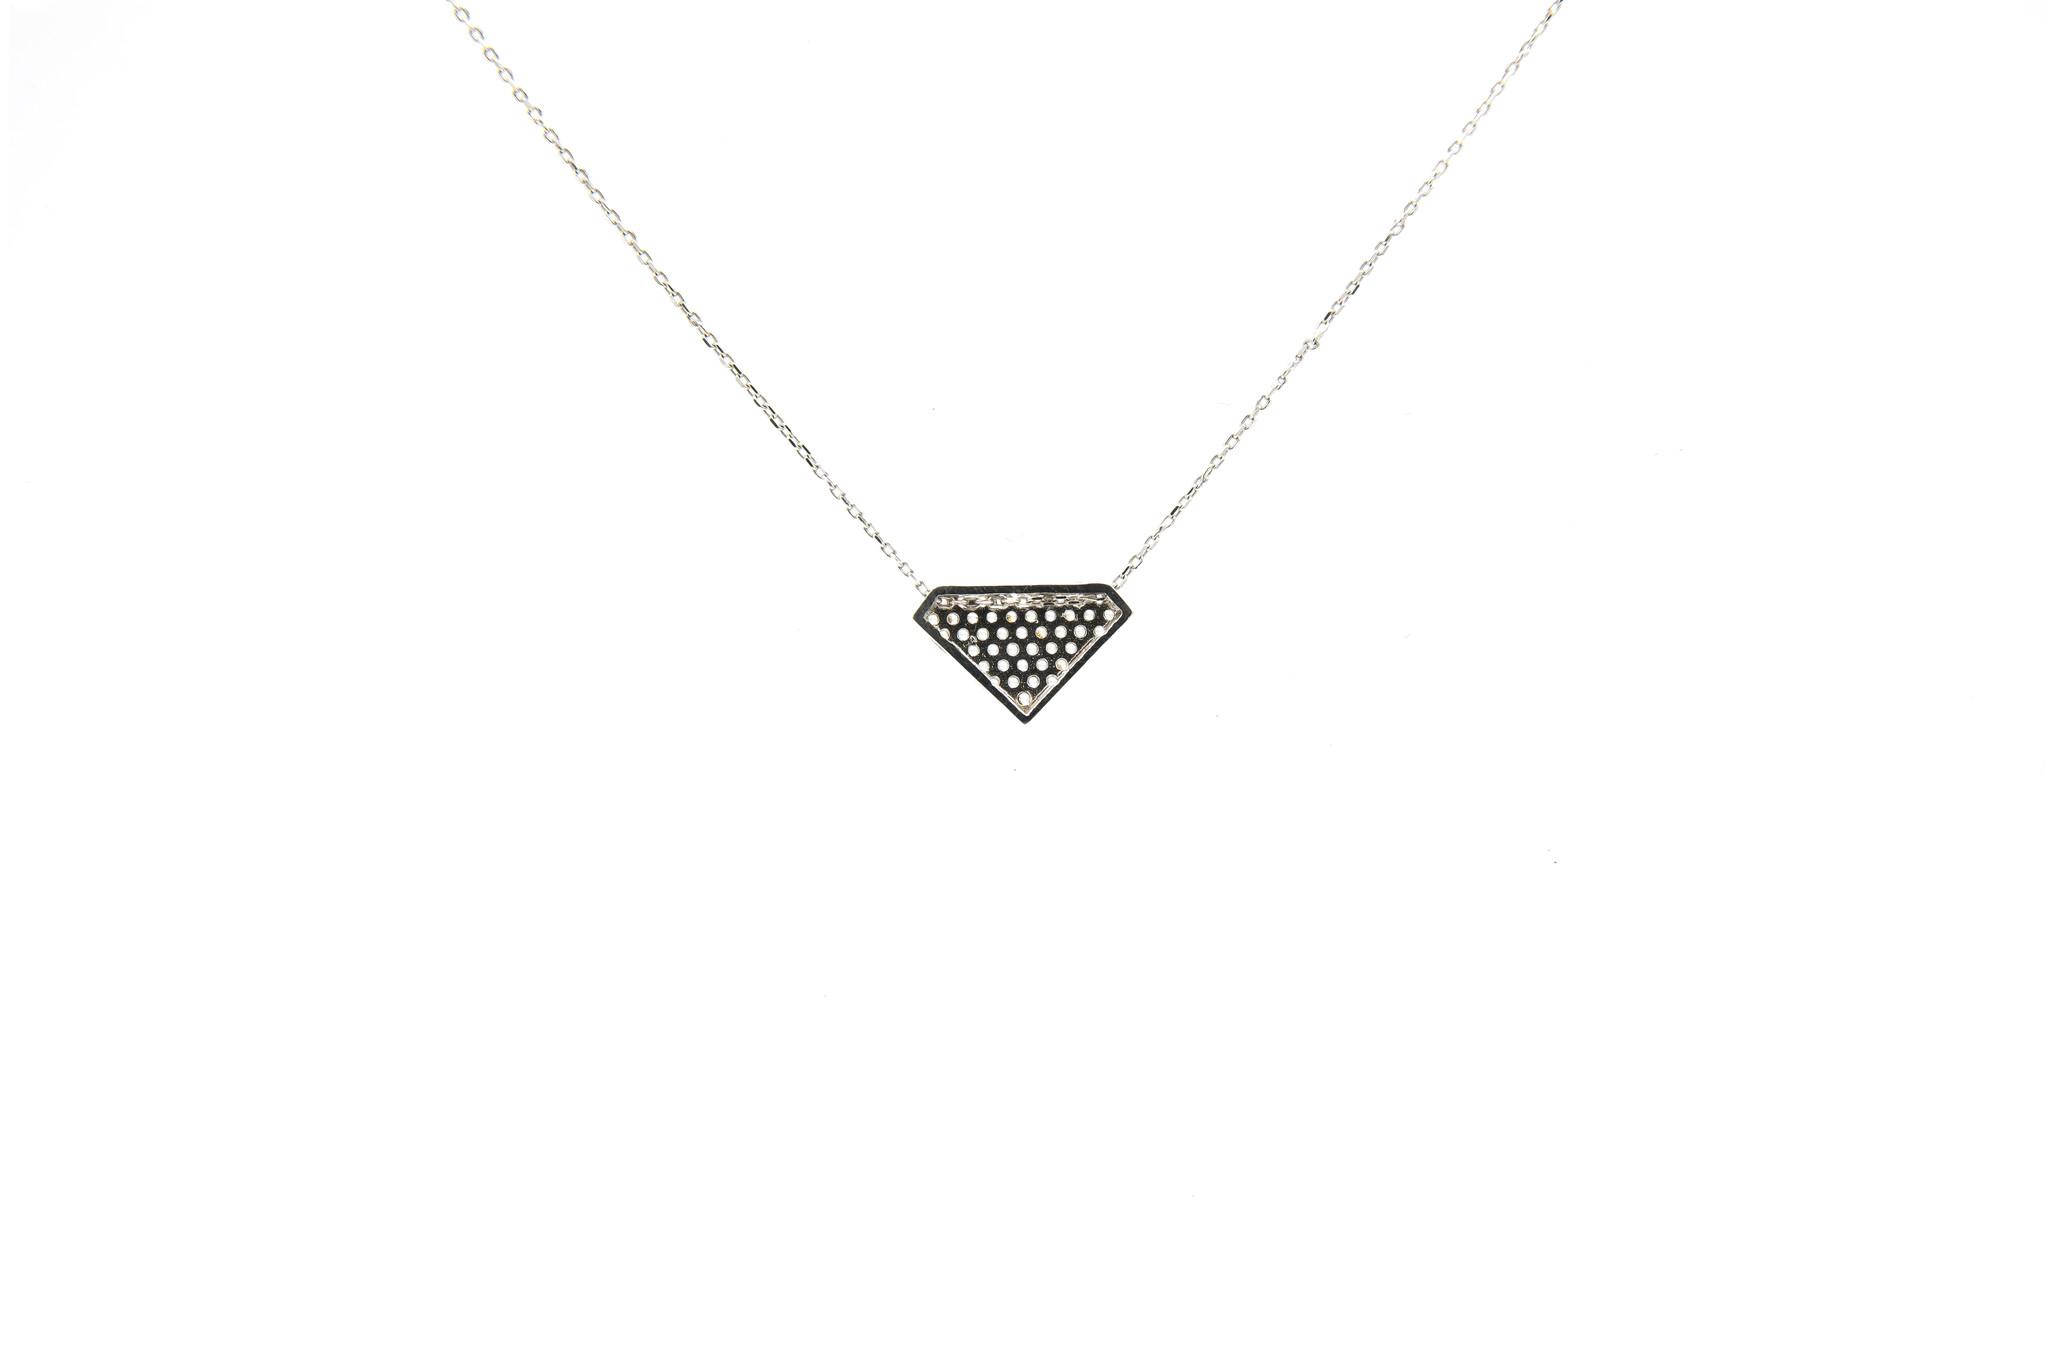 Ketting met vaste hanger diamantvorm witgoud-4